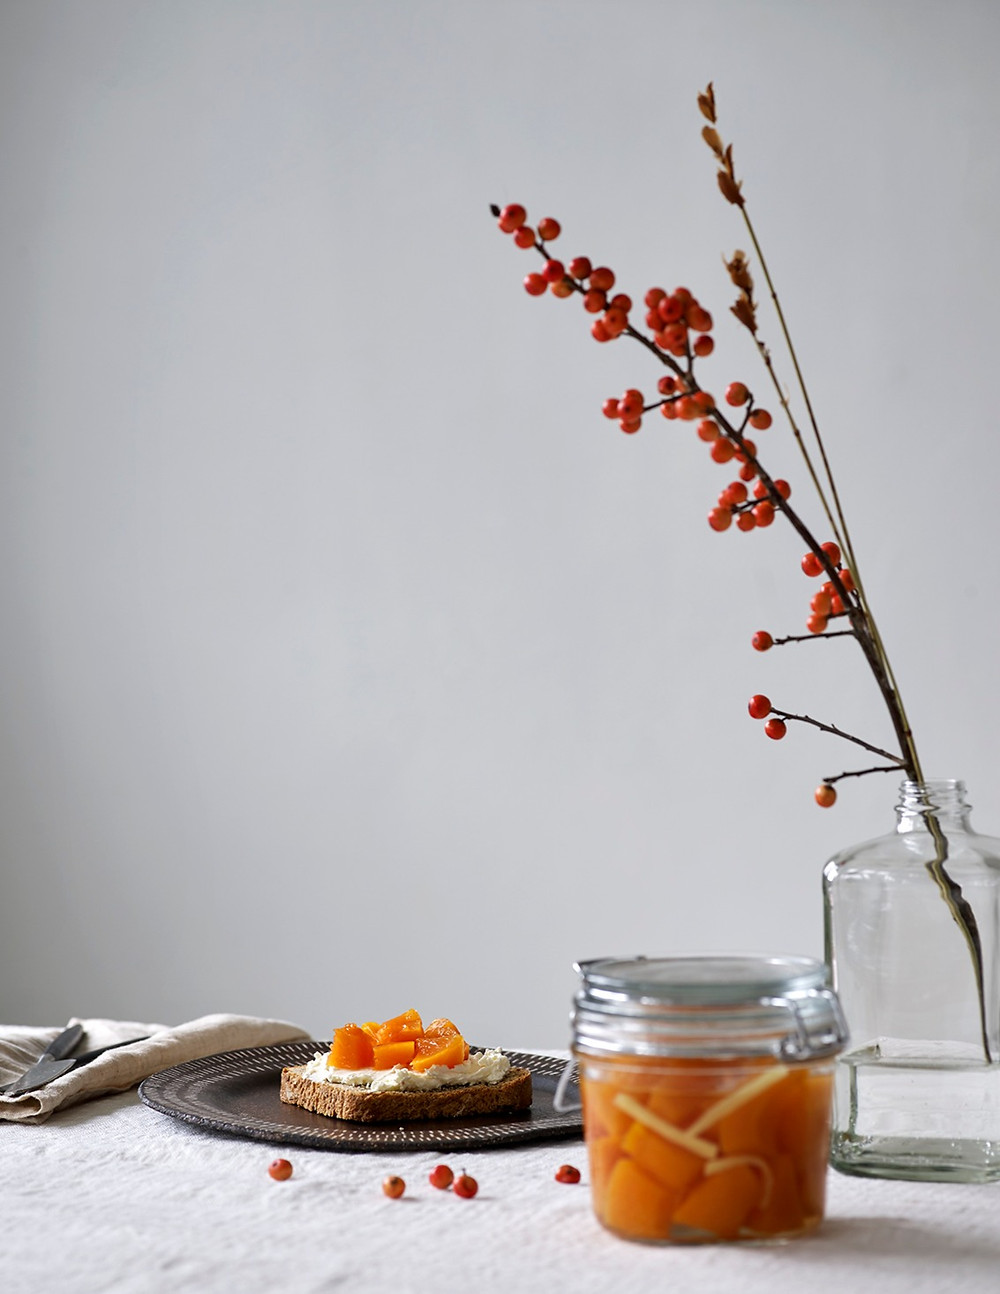 Brødskive med chévrekrem og syltede gresskar